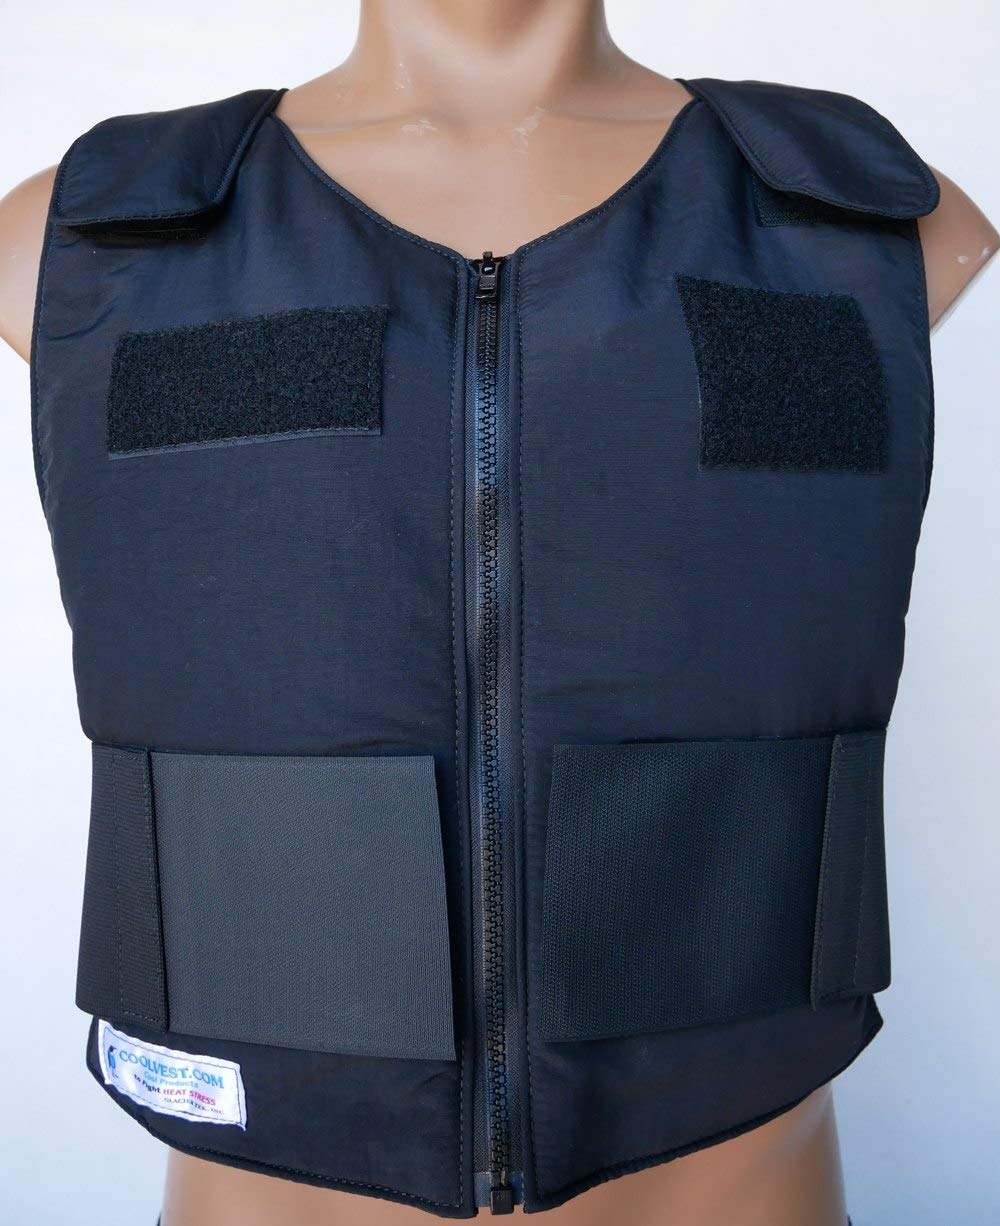 Glacier Tek Law Enforcement Cool Vest with Set of 8 Nontoxic Cooling Packs Black